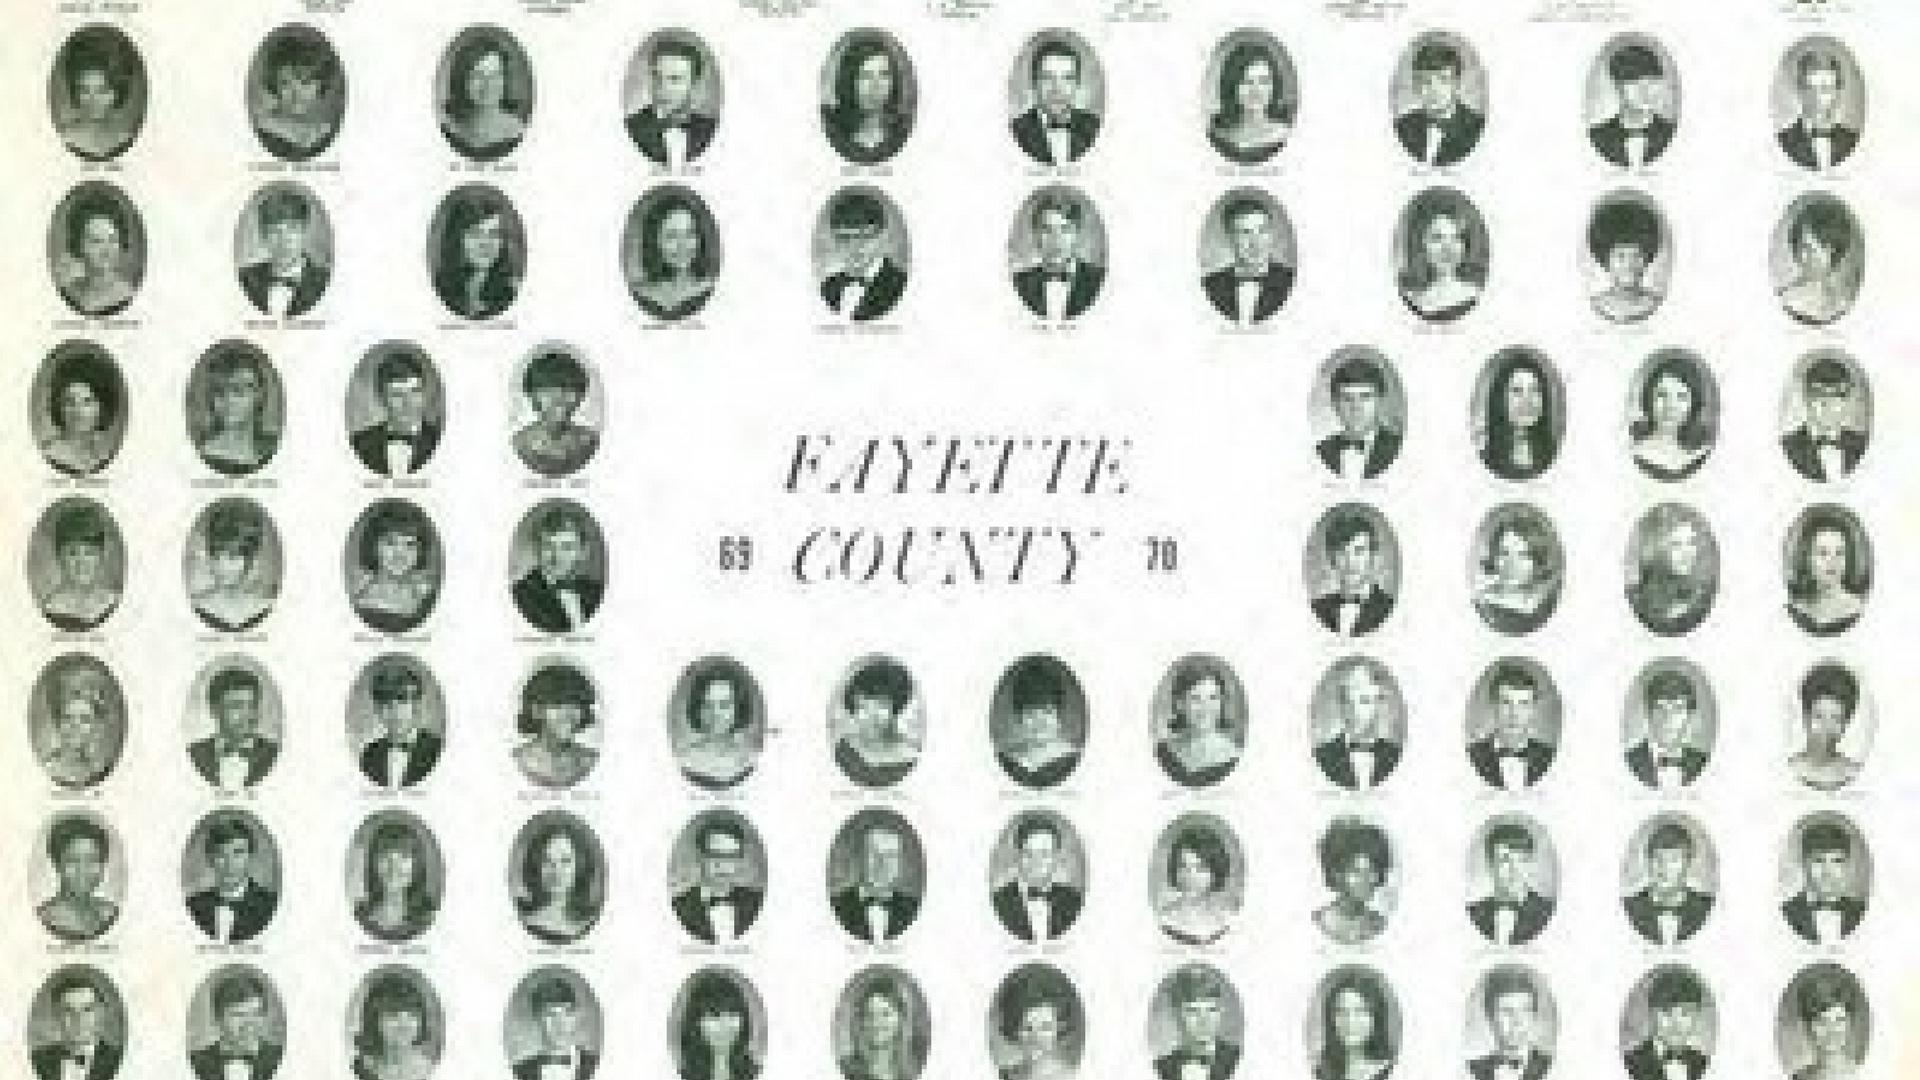 Graduating Class 1970, Fayette County High School